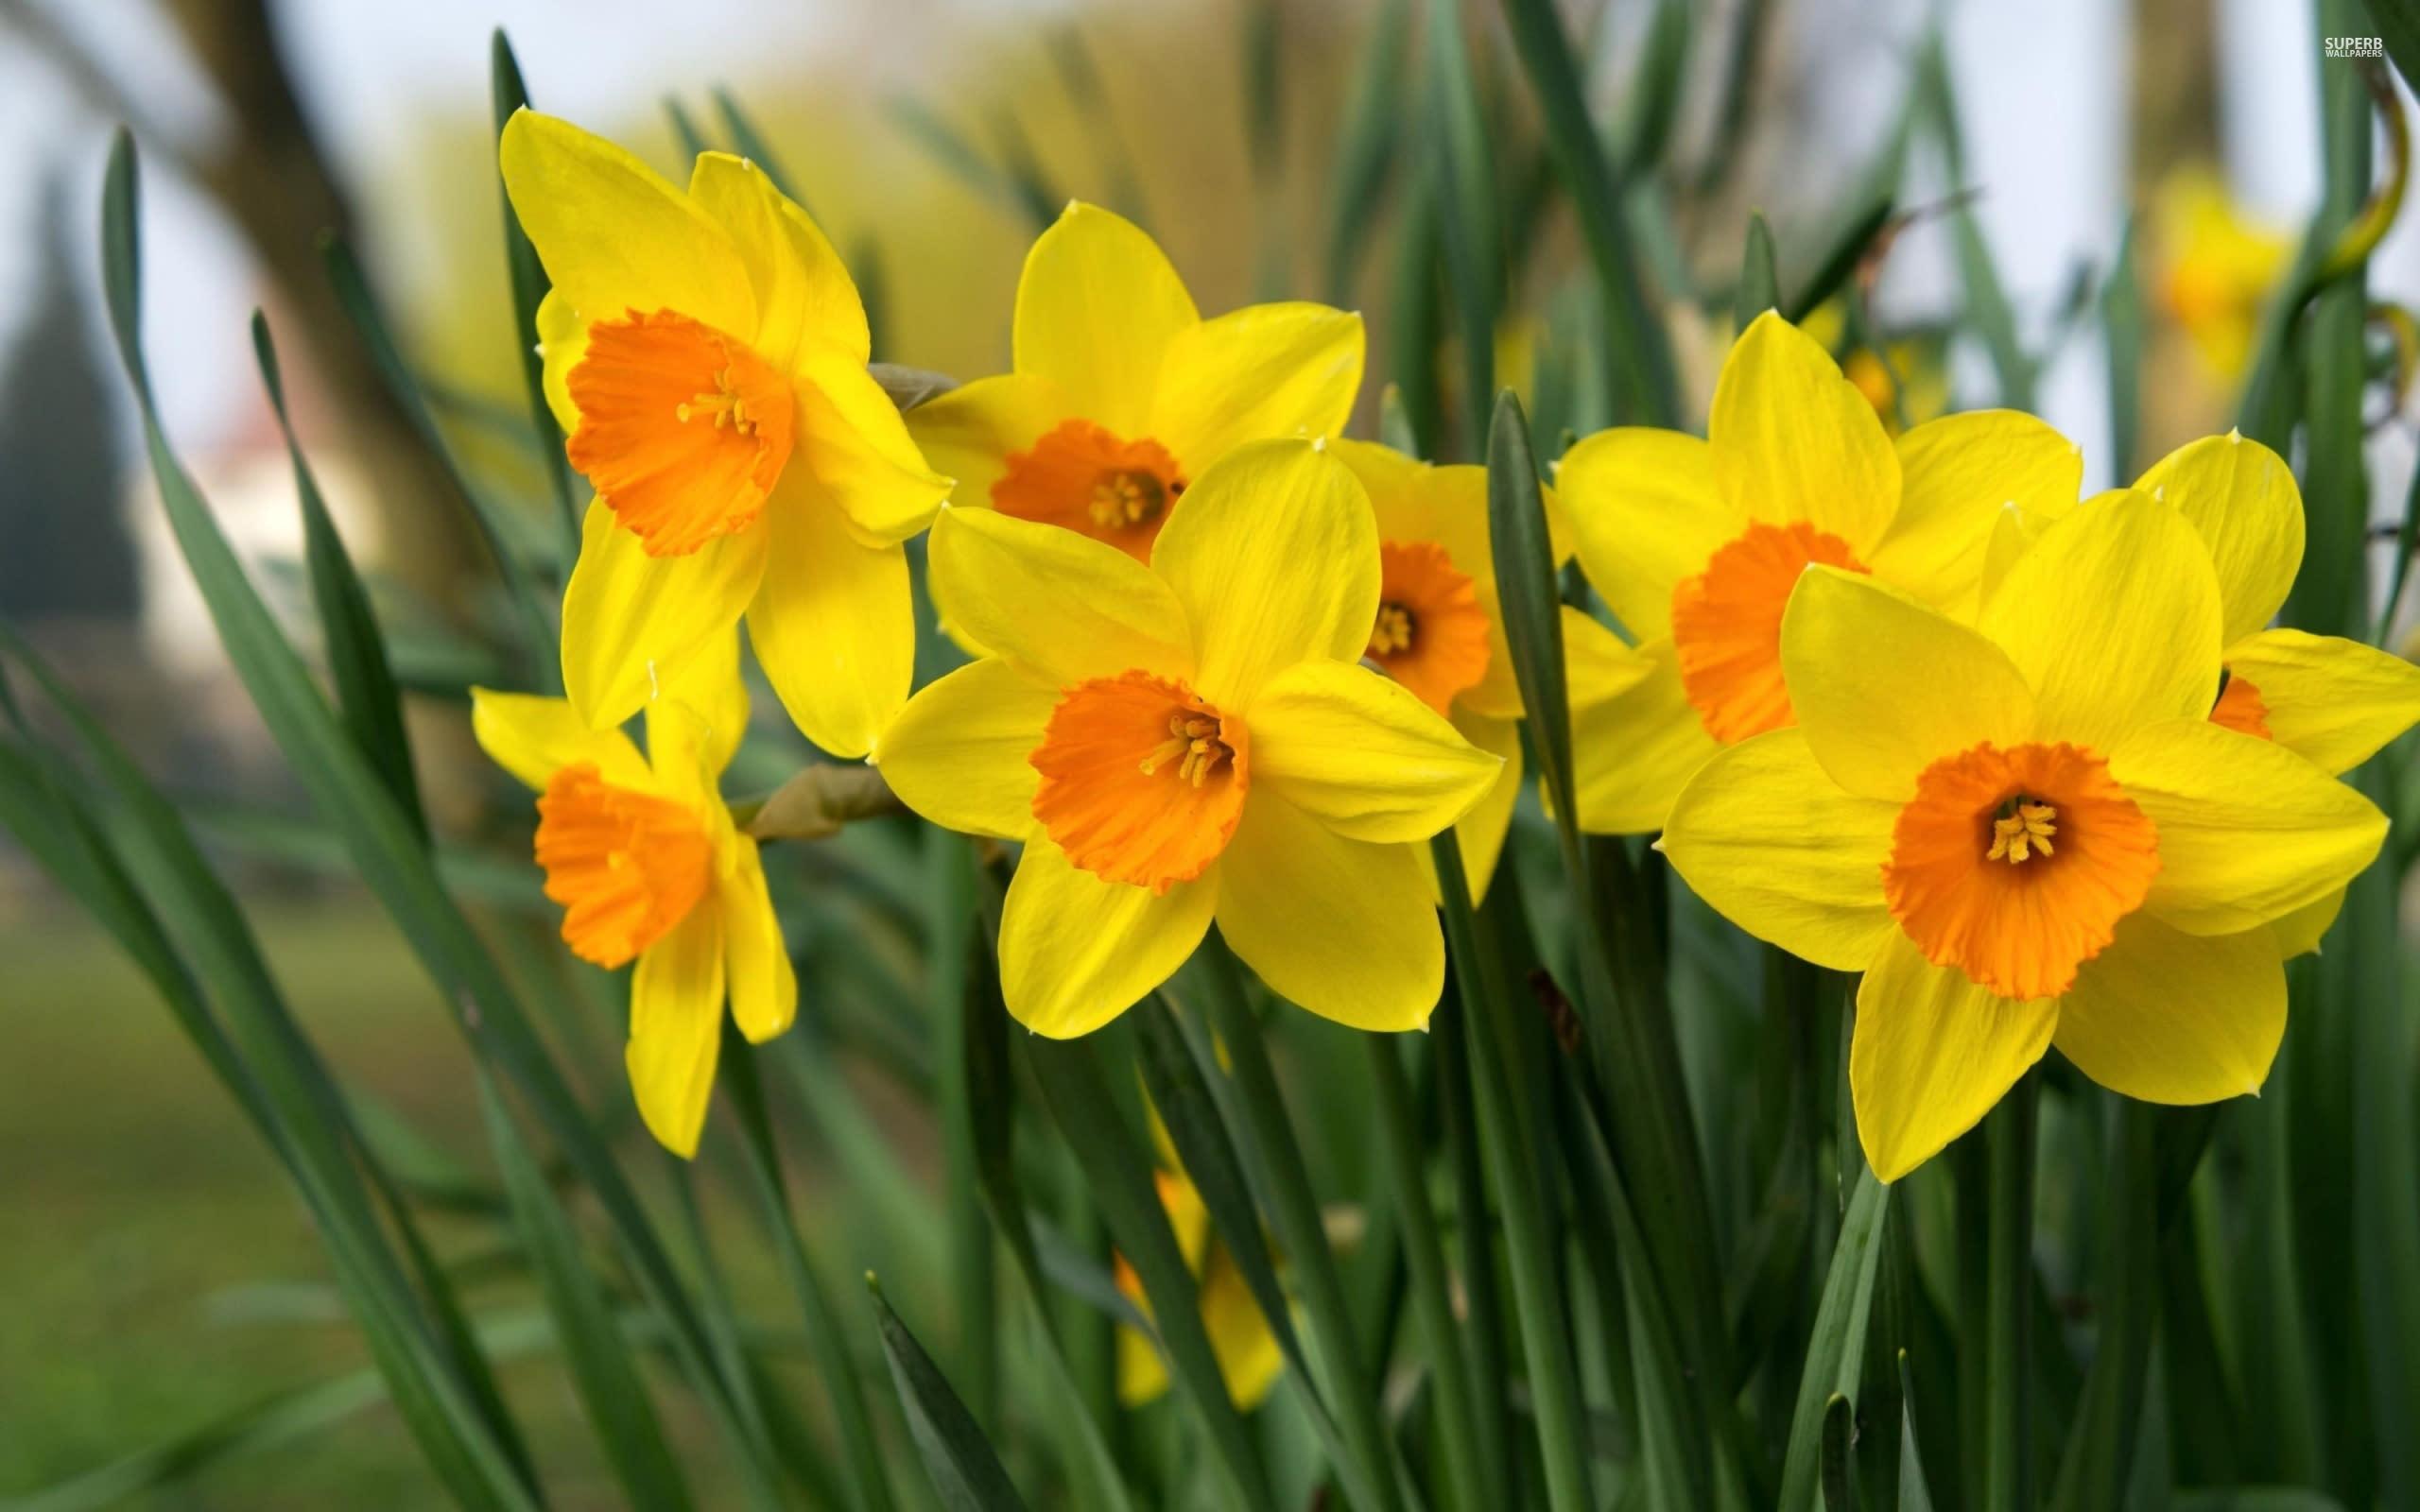 daffodils-40029-2560x1600